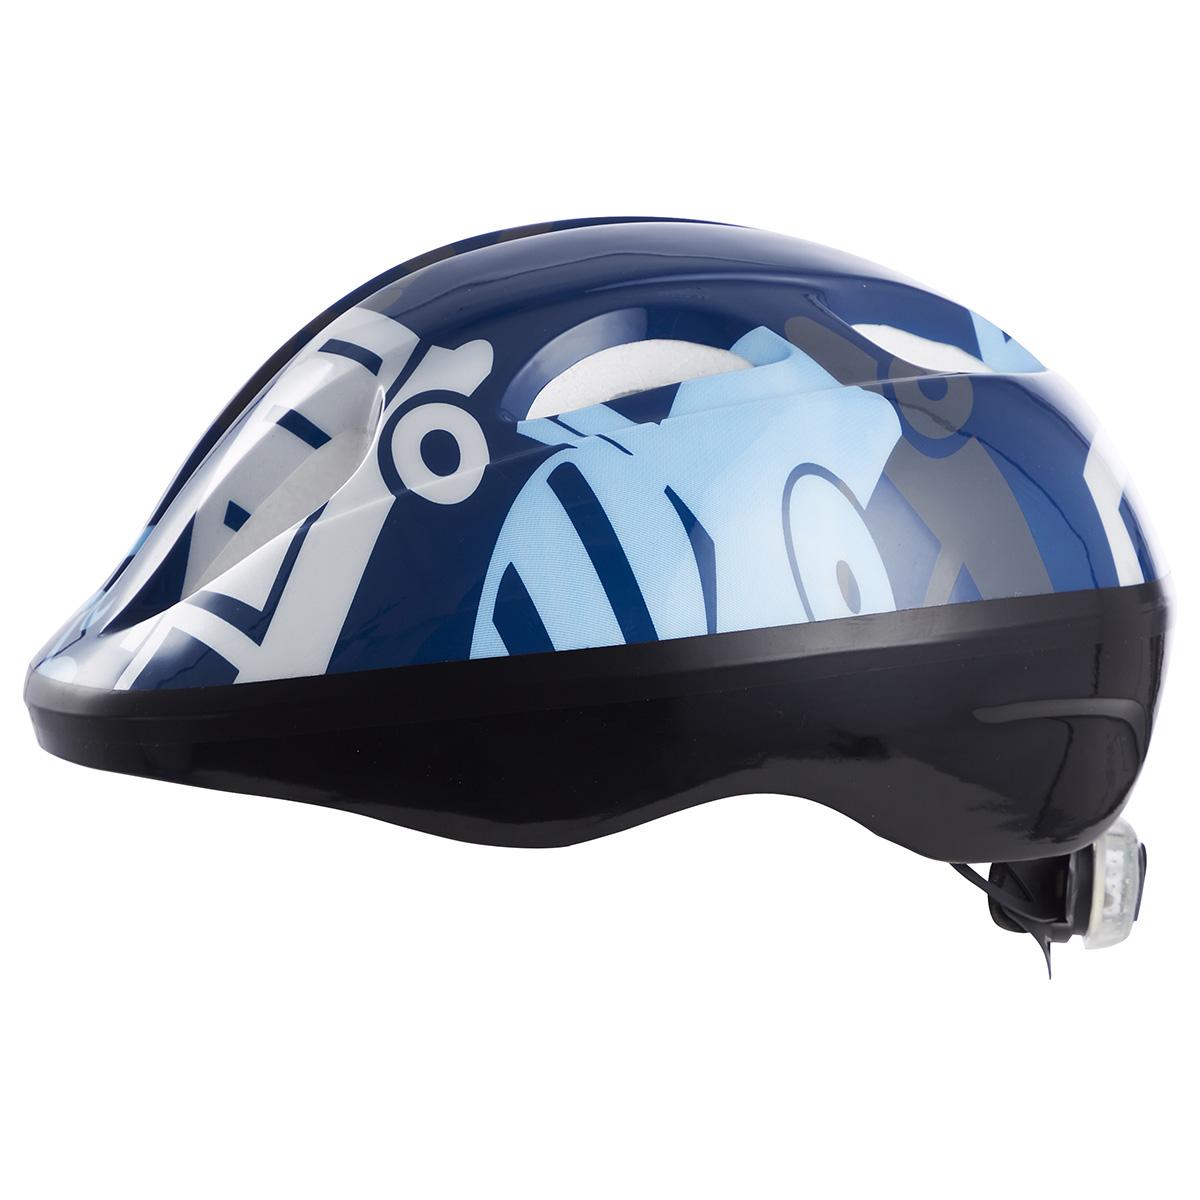 Rawlink cykelhjelm til børn - Blå | Hjelme